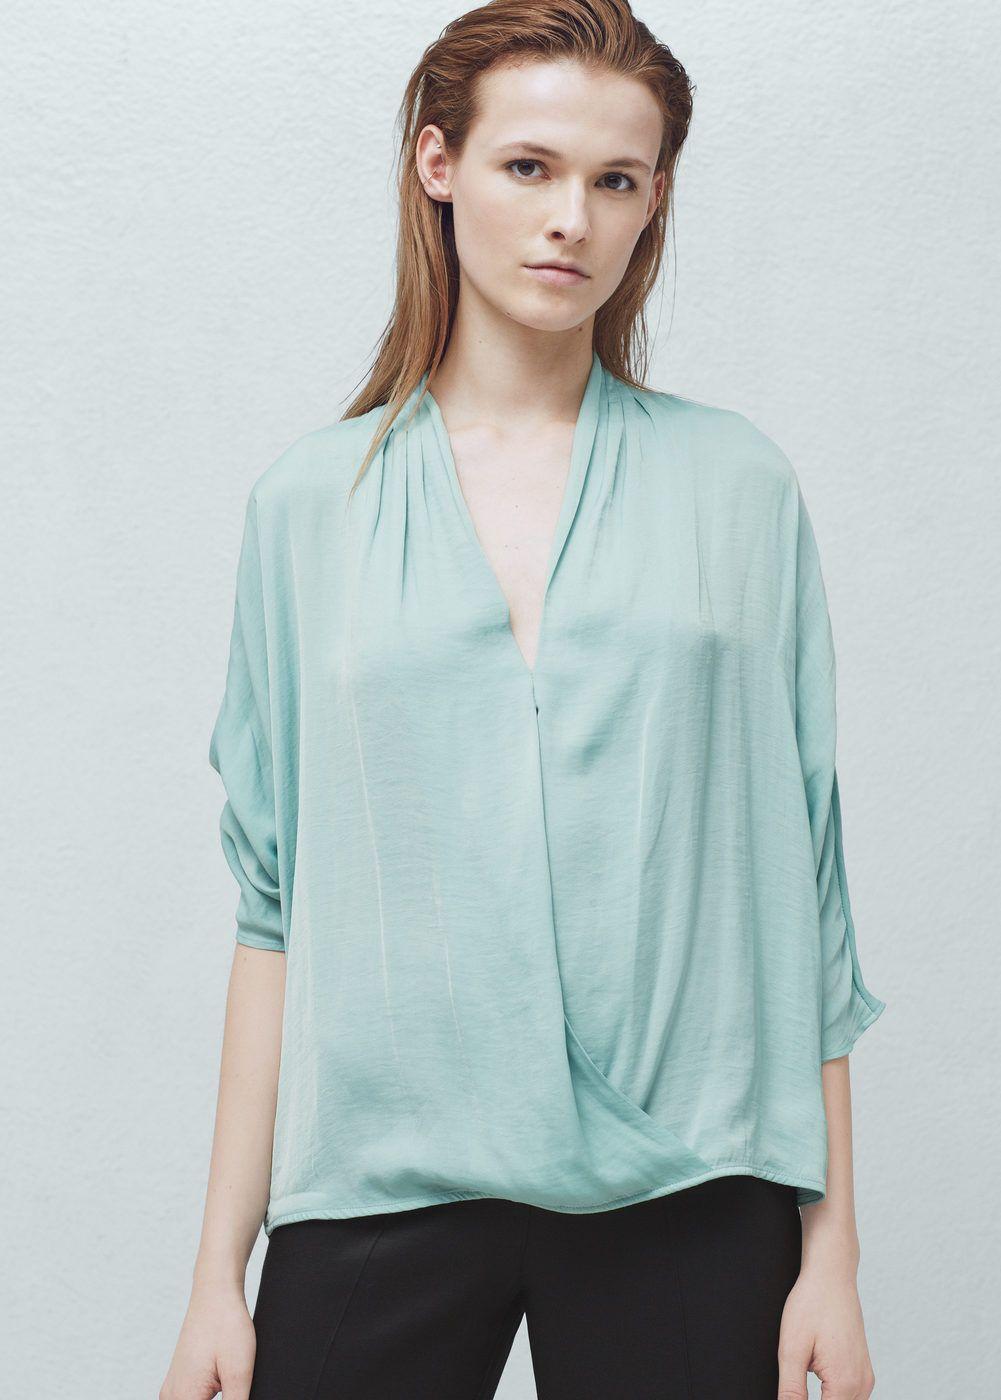 Wrap v-neckline blouse | Neckline, Wraps and Clothes